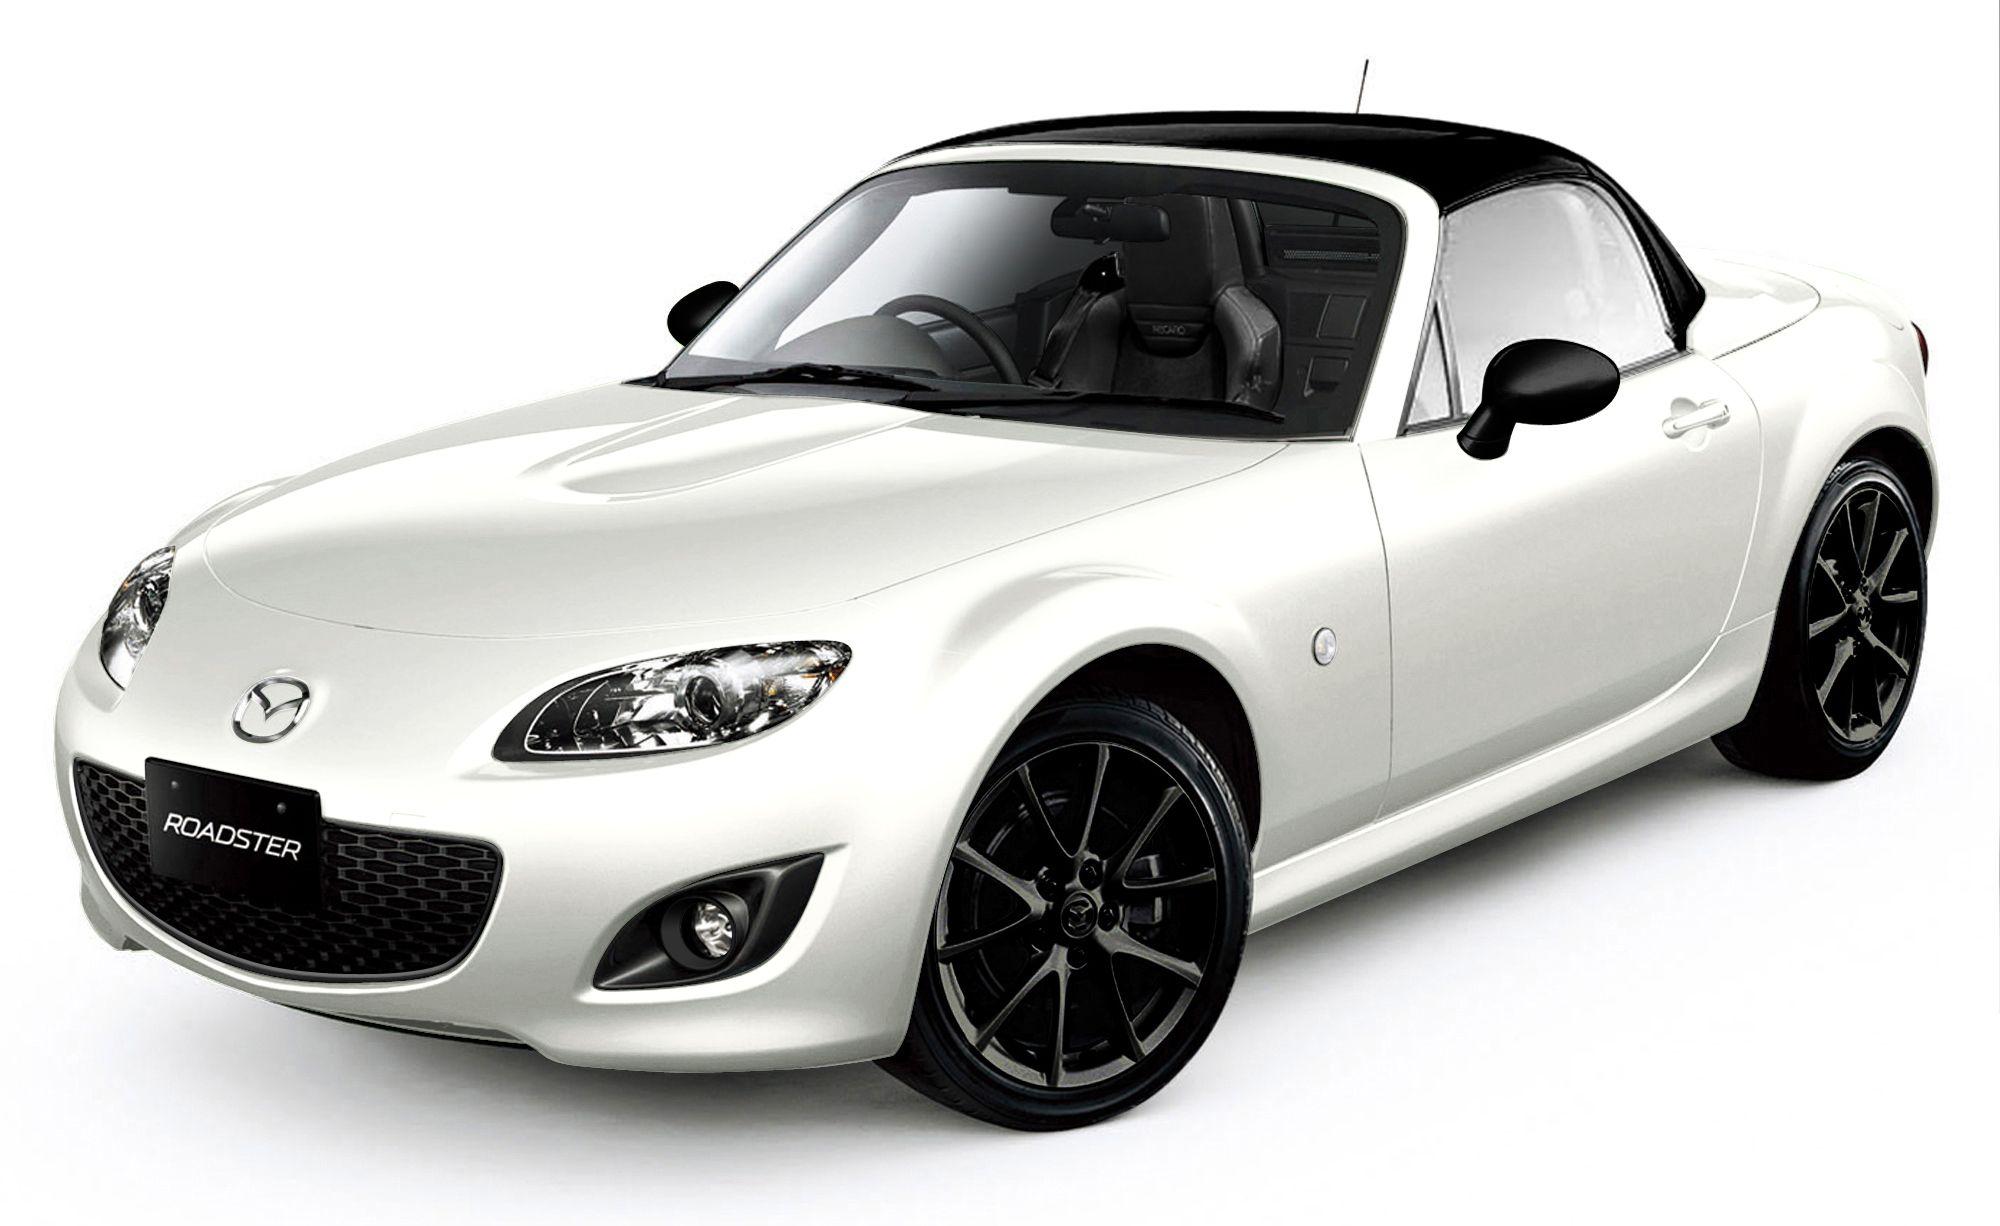 https://www.conceptcarz.com/images/Mazda/Mazda-Miata-Special-Edition-MX5-2012-01.jpg